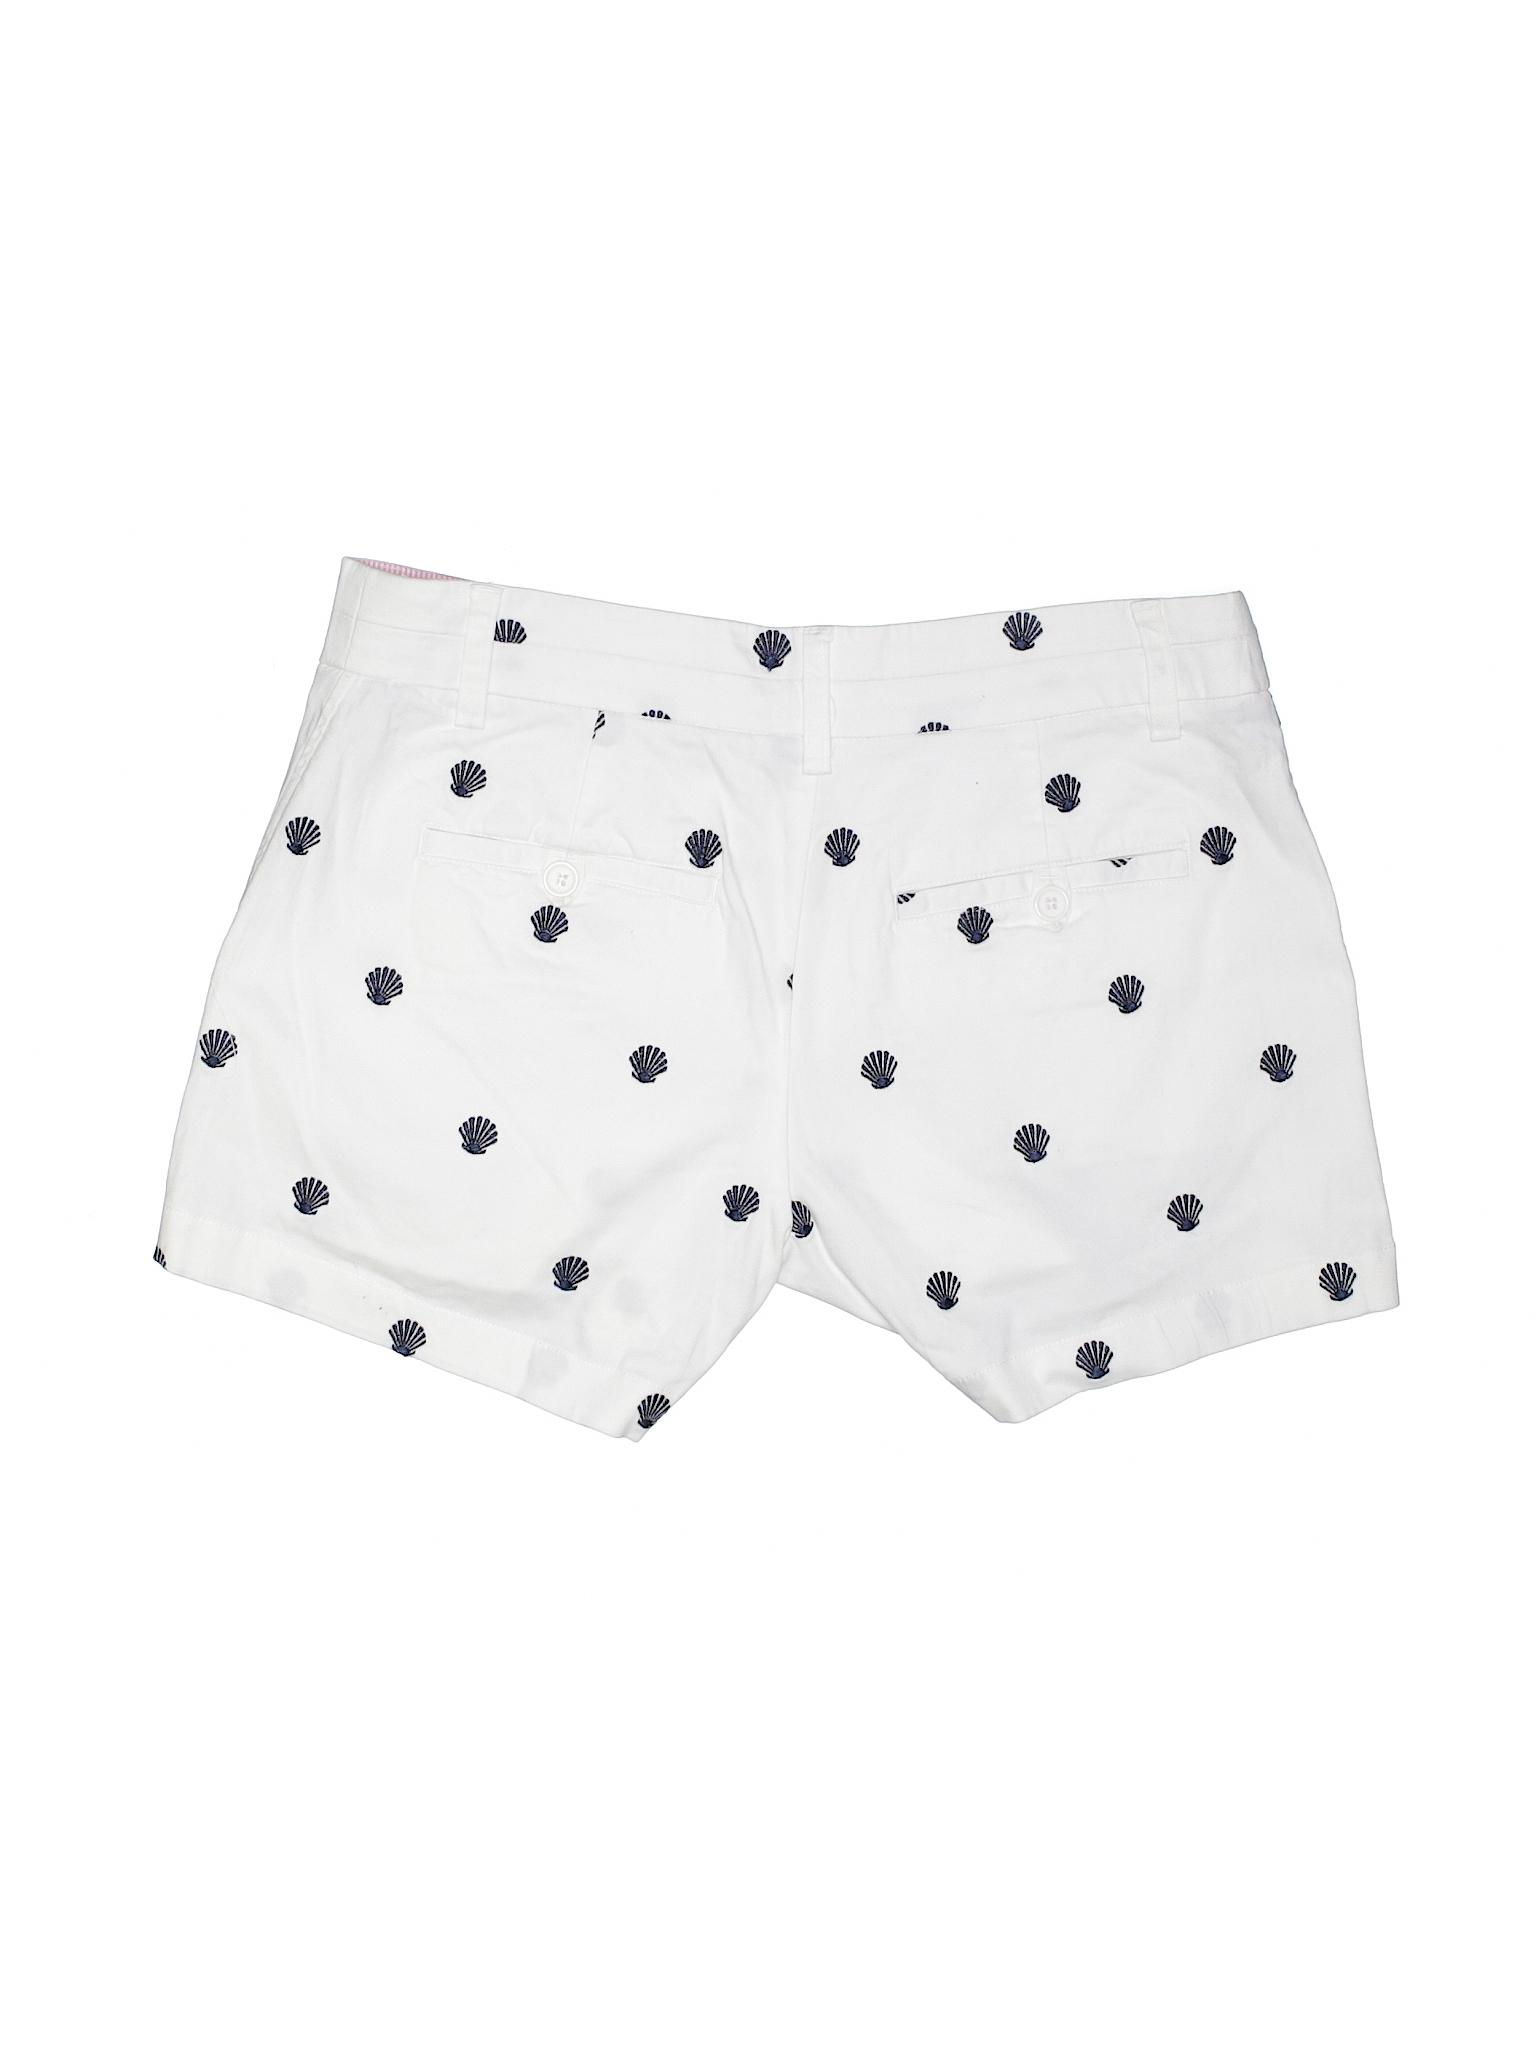 Khaki leisure Shorts Boutique British Khaki SE7dqSFwB